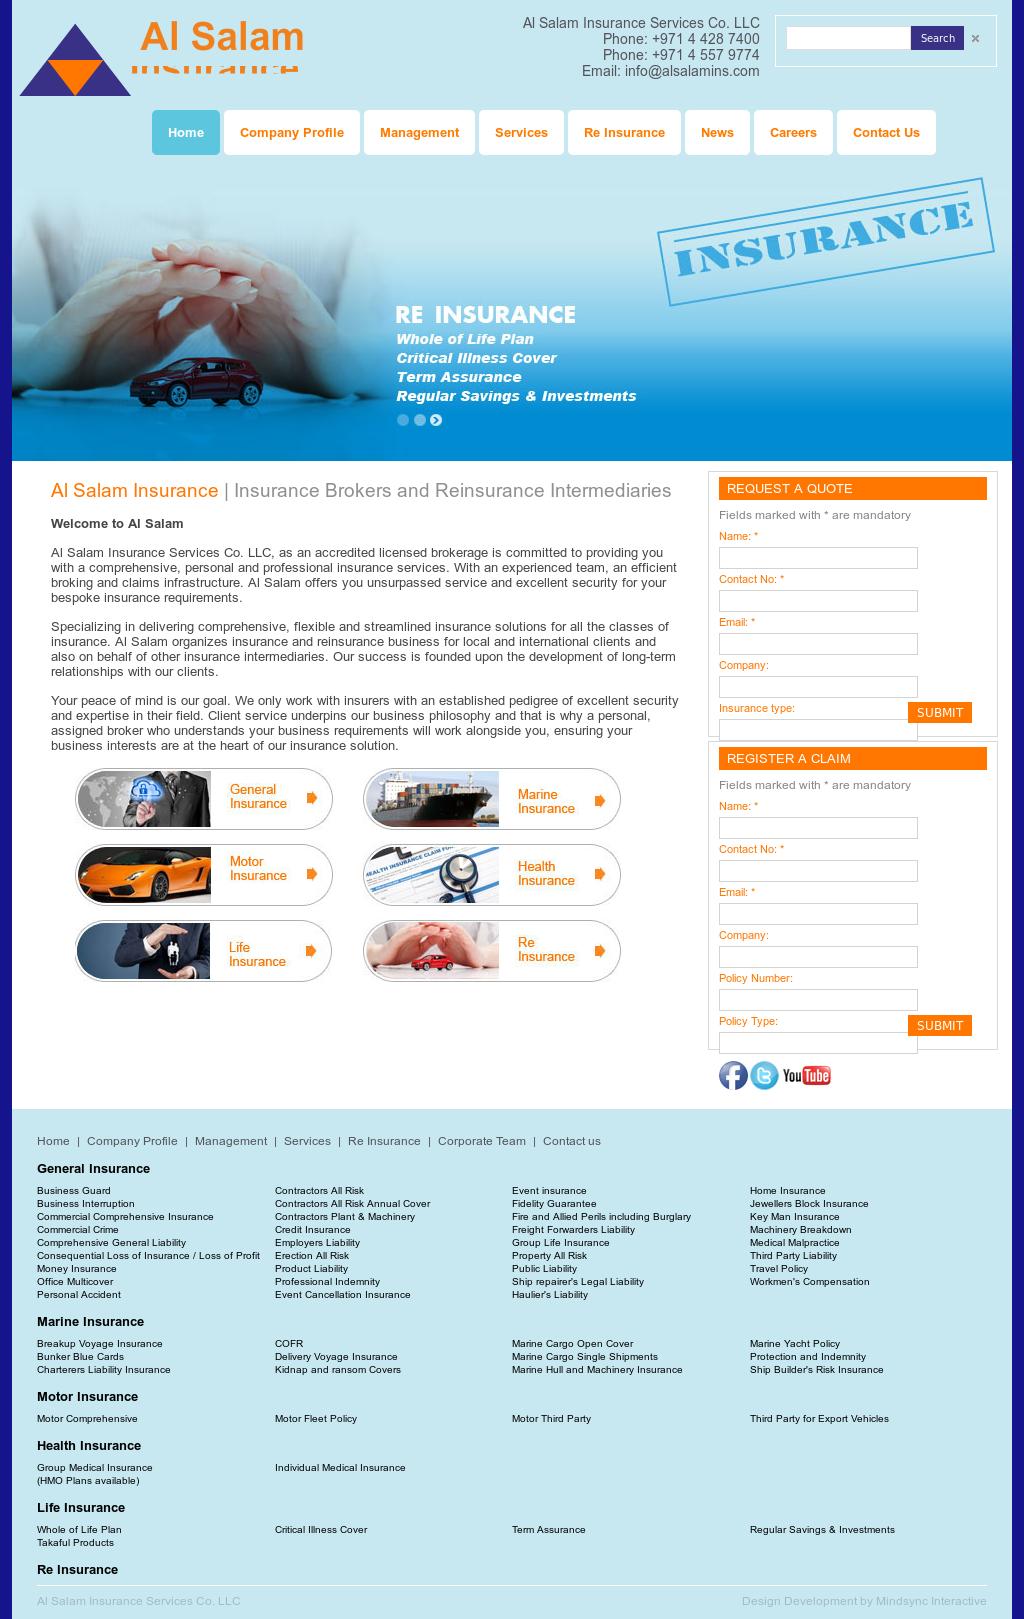 Al Salam Insurance Services Company